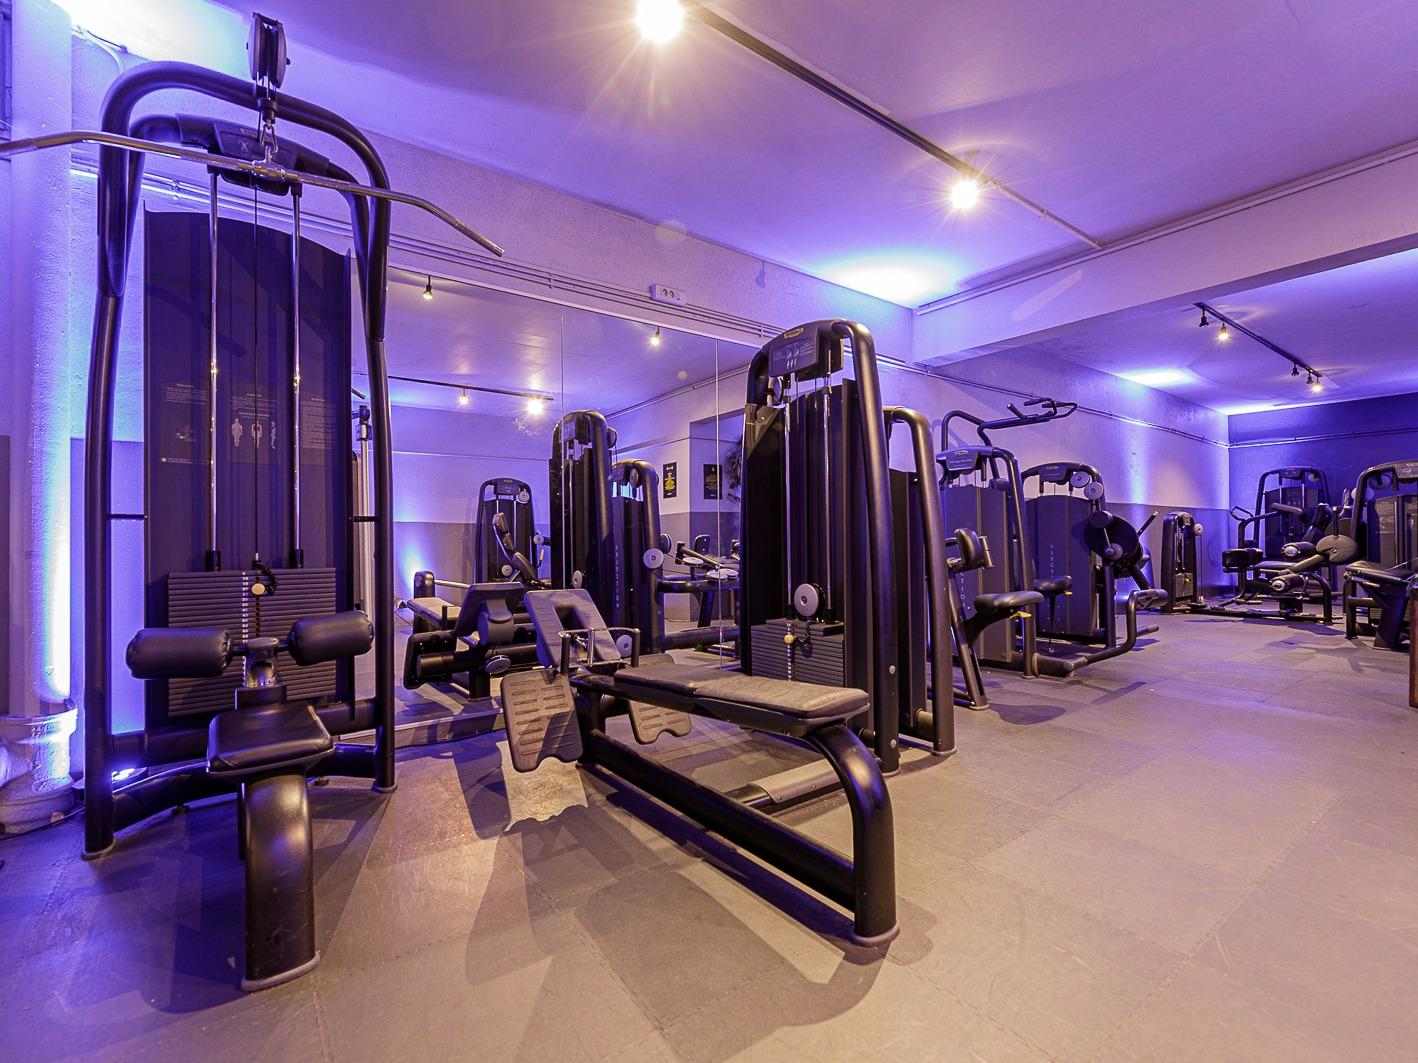 My Fitness Studio Paris 20 Tarifs Avis Horaires Essai Gratuit